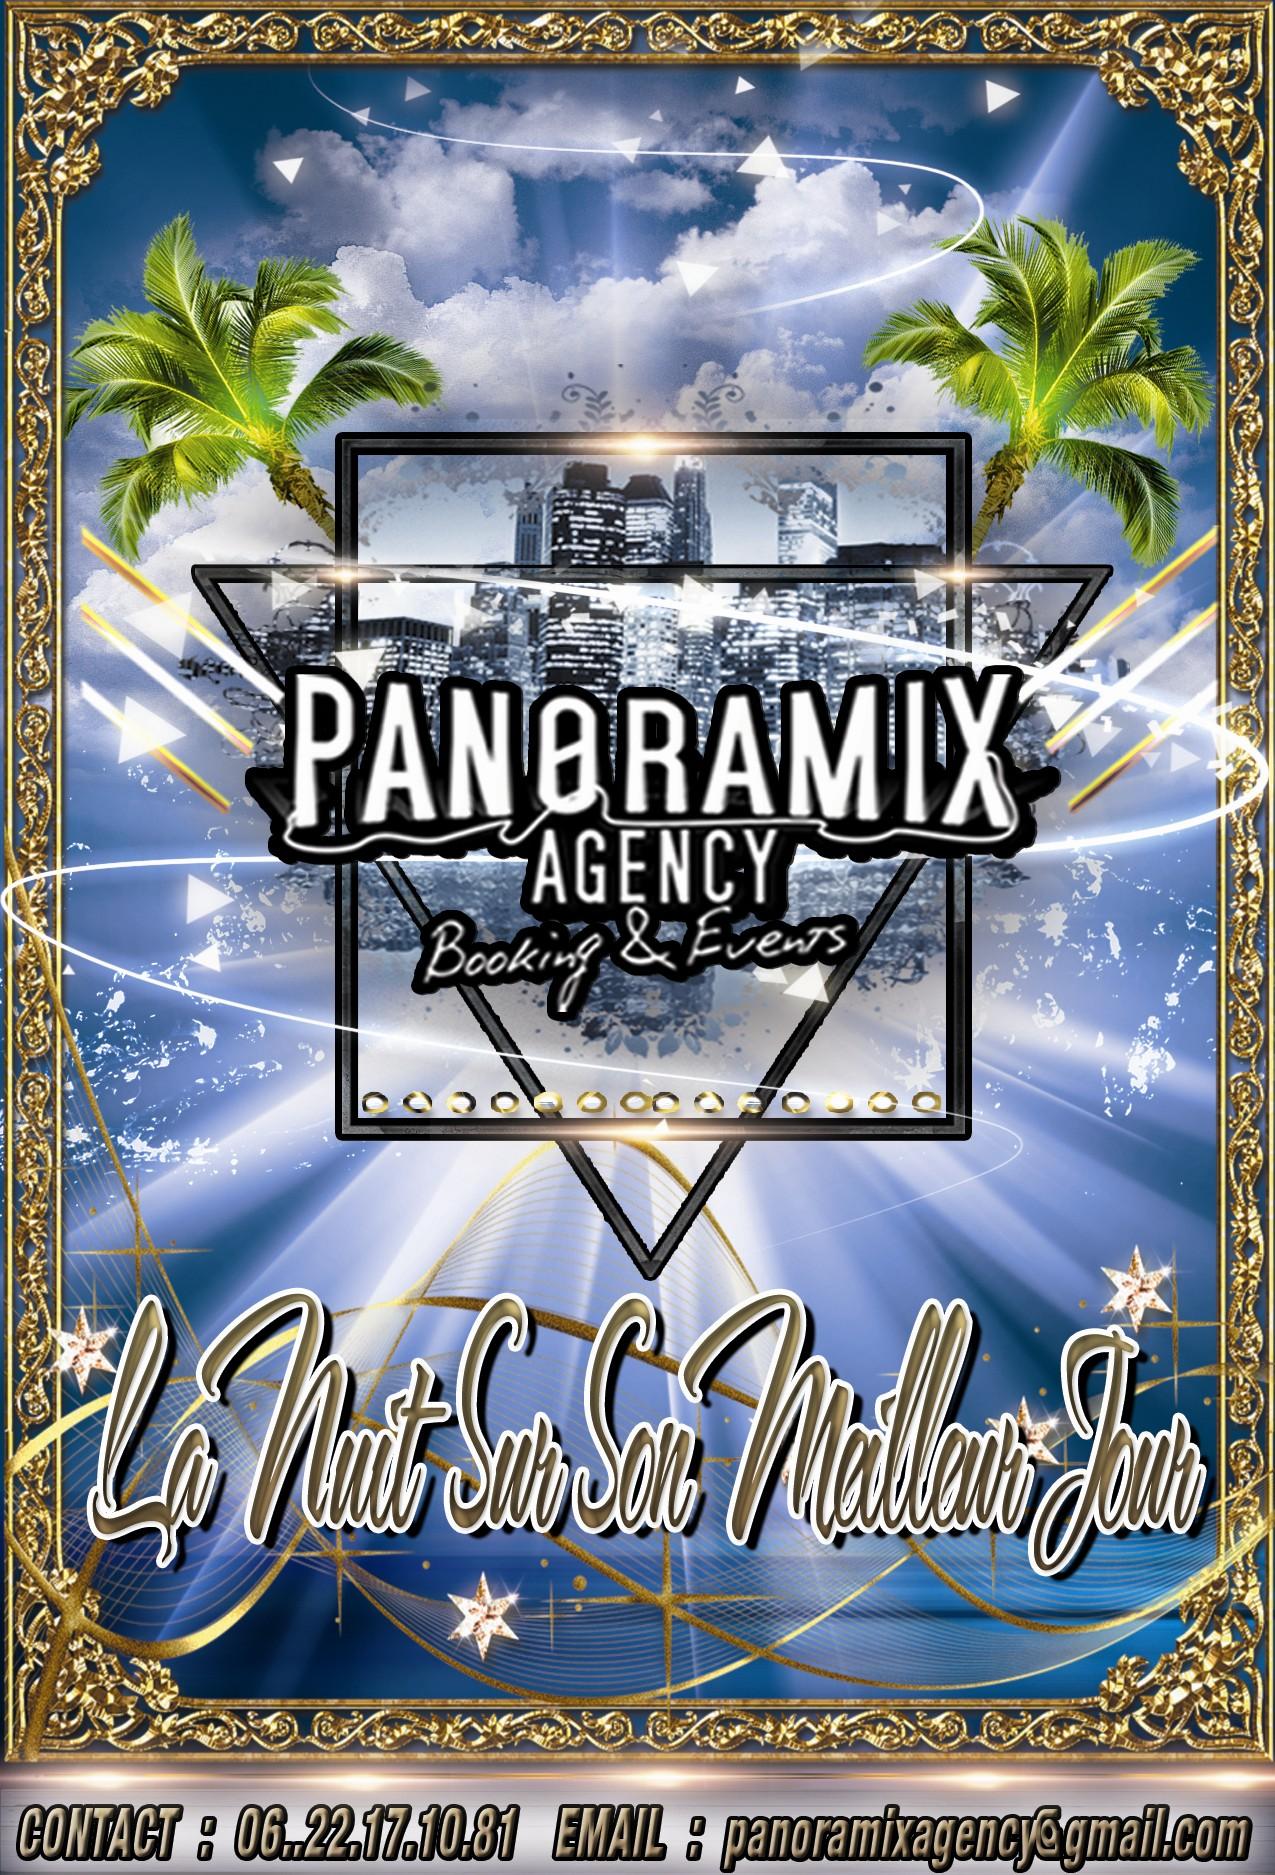 https://panoramix-radio-station.com/wp-content/uploads/2017/03/PANORAMIX-AGENCY-AFFICHE.jpg